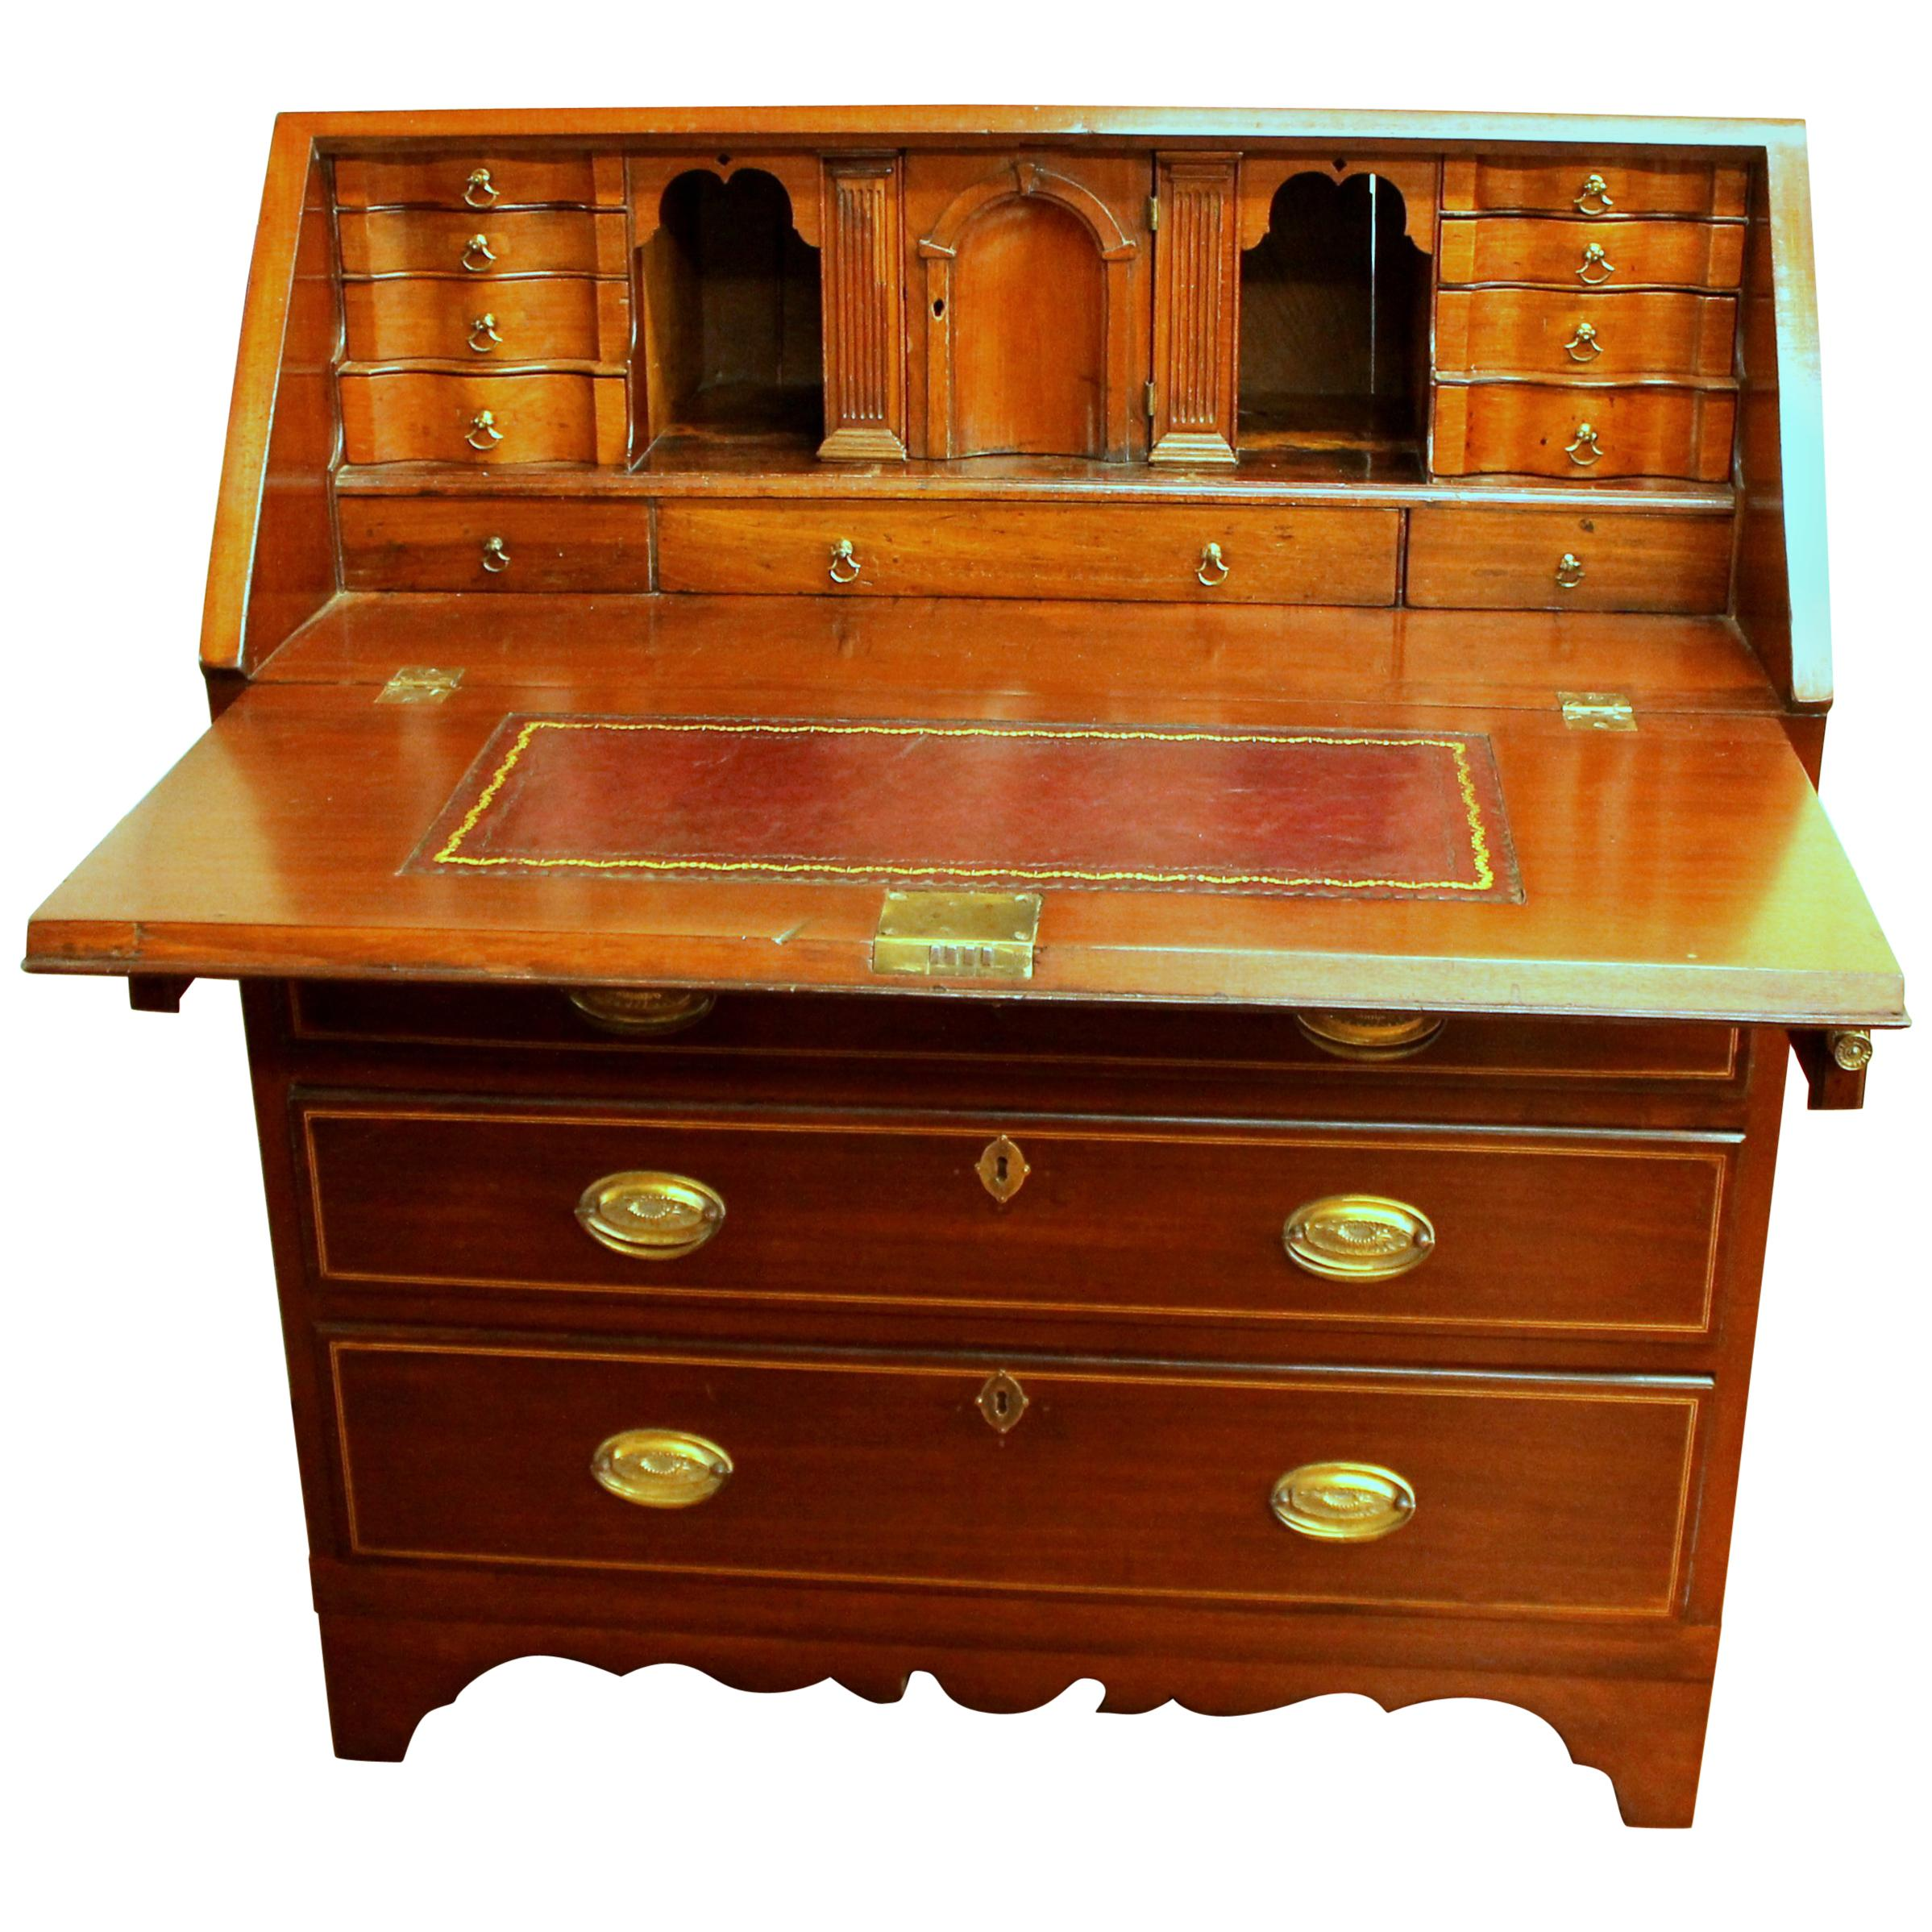 bureau english Antique English Inlaid Mahogany George III Slant-Front Bureau, Superb  Interior For Sale